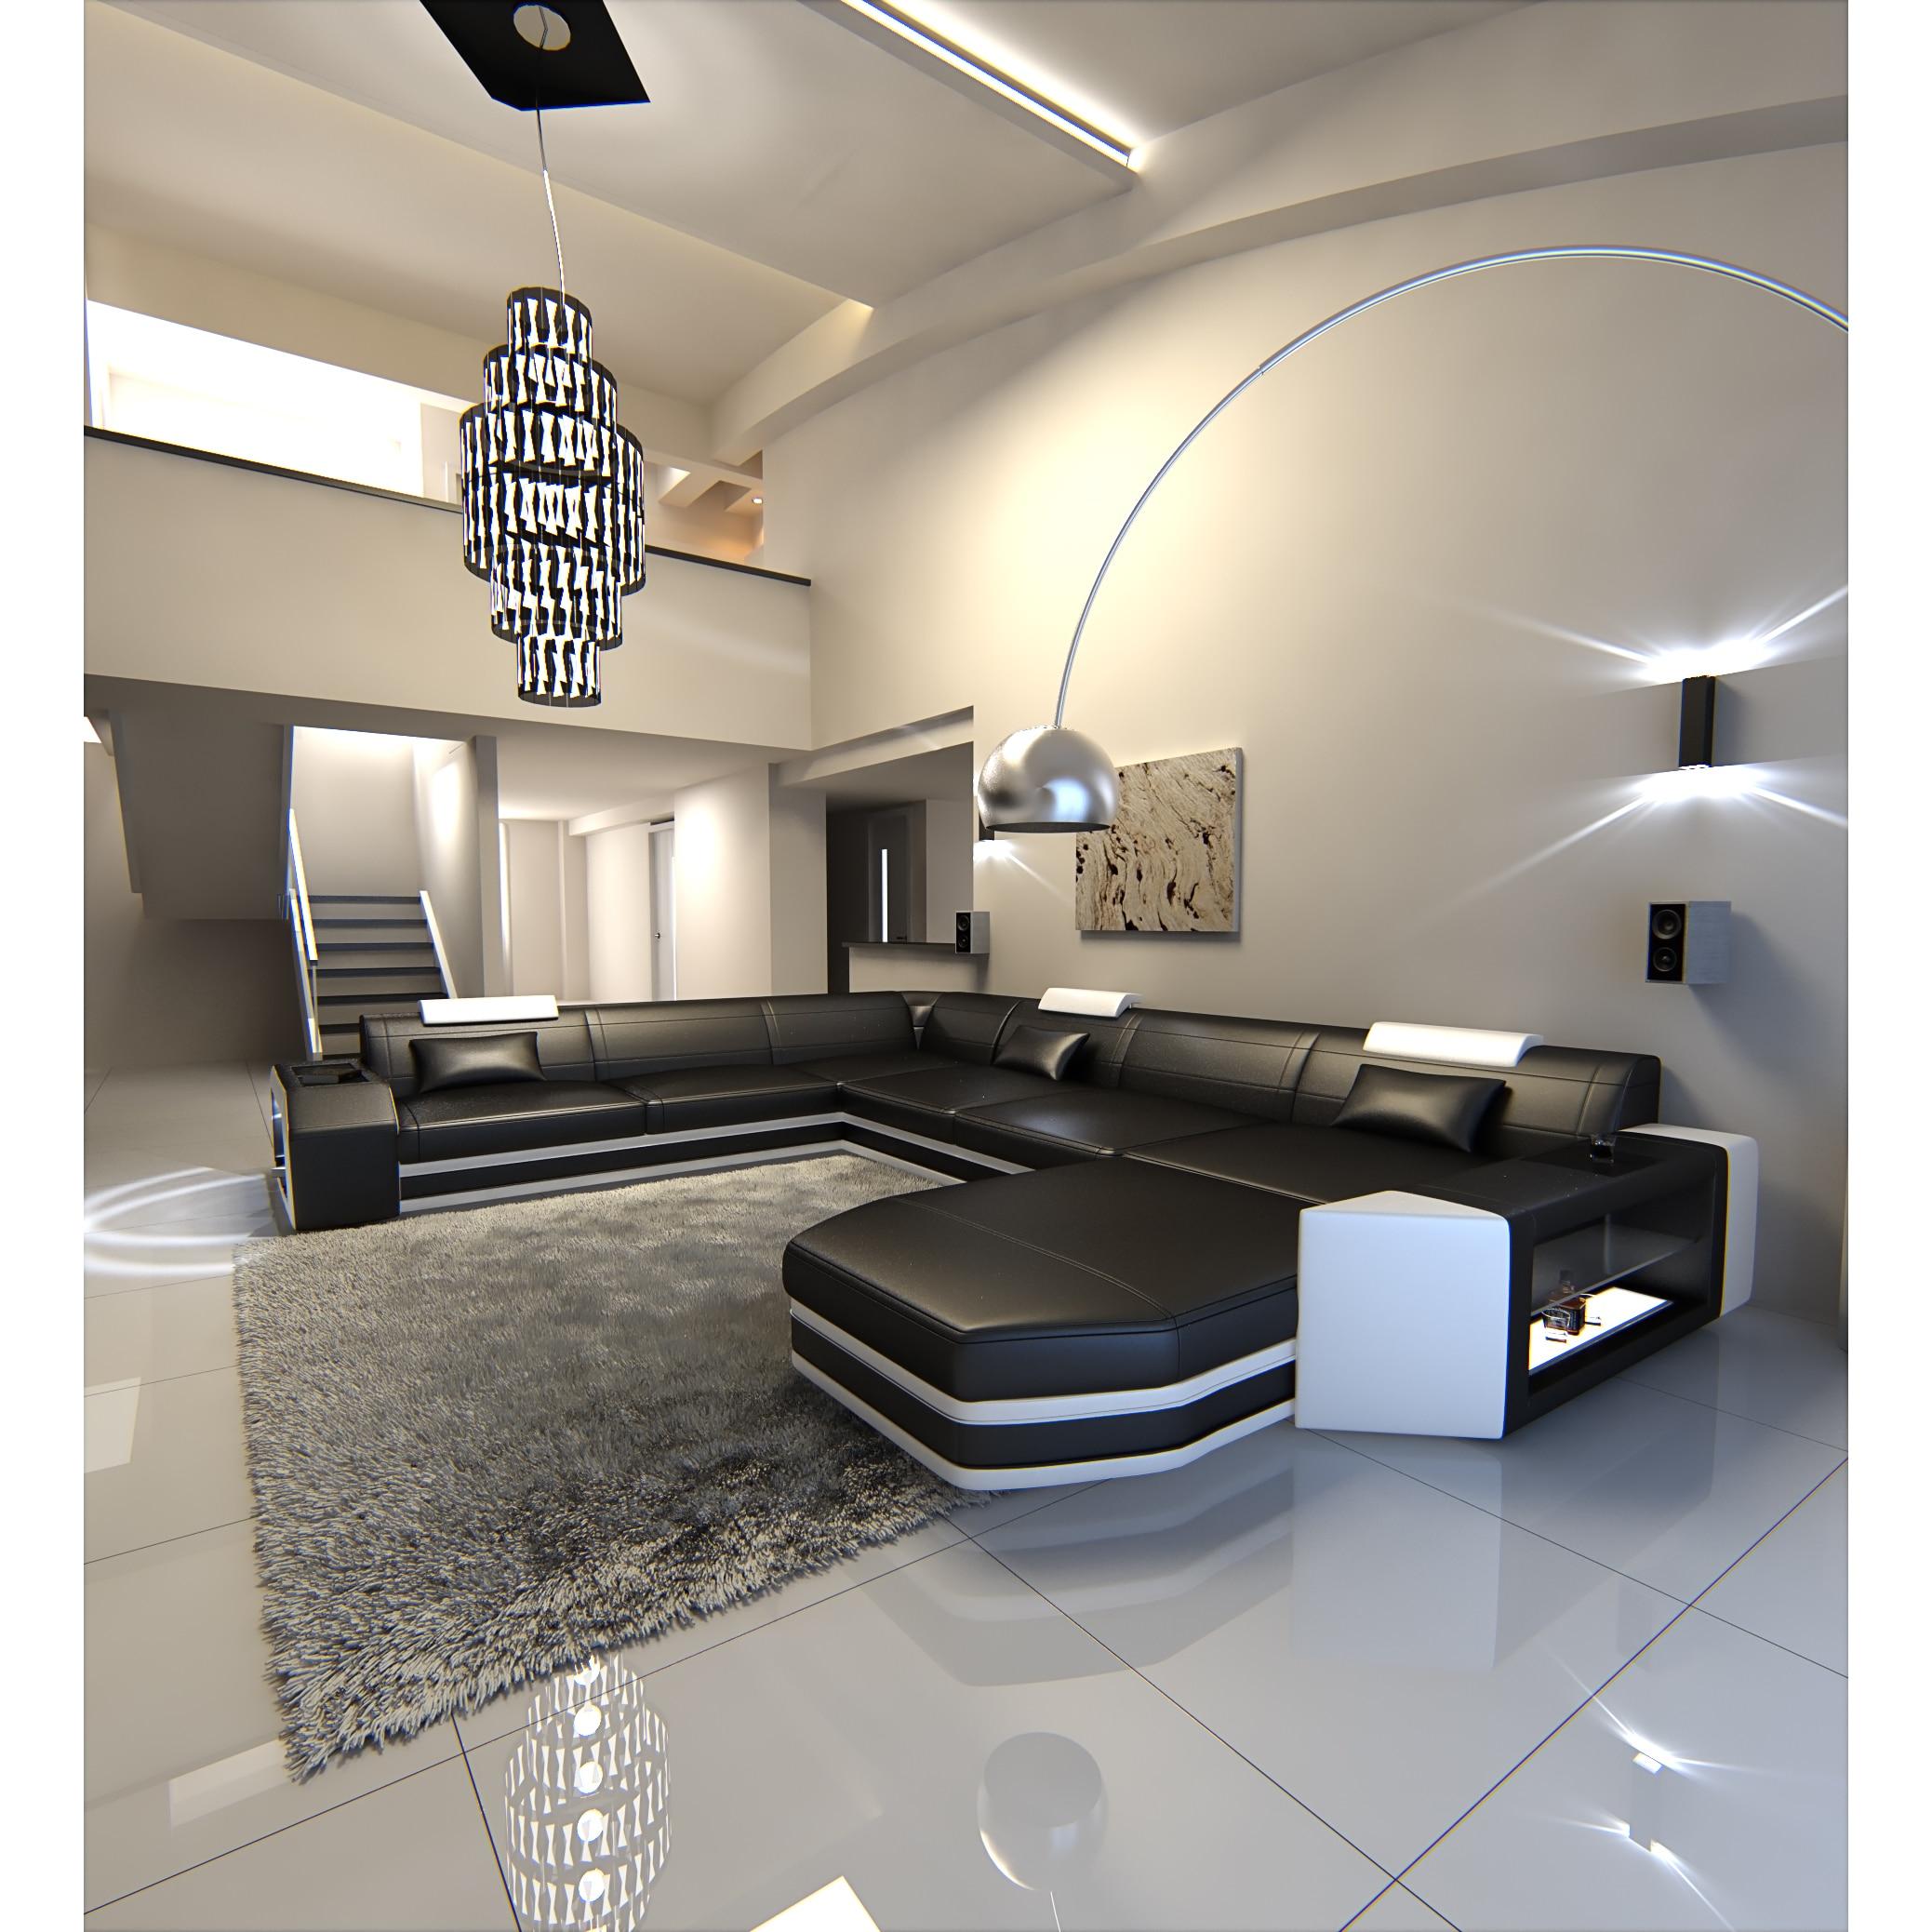 Sofadreams Modern U Shaped Sectional Sofa Dallas Xxl With Led Lights